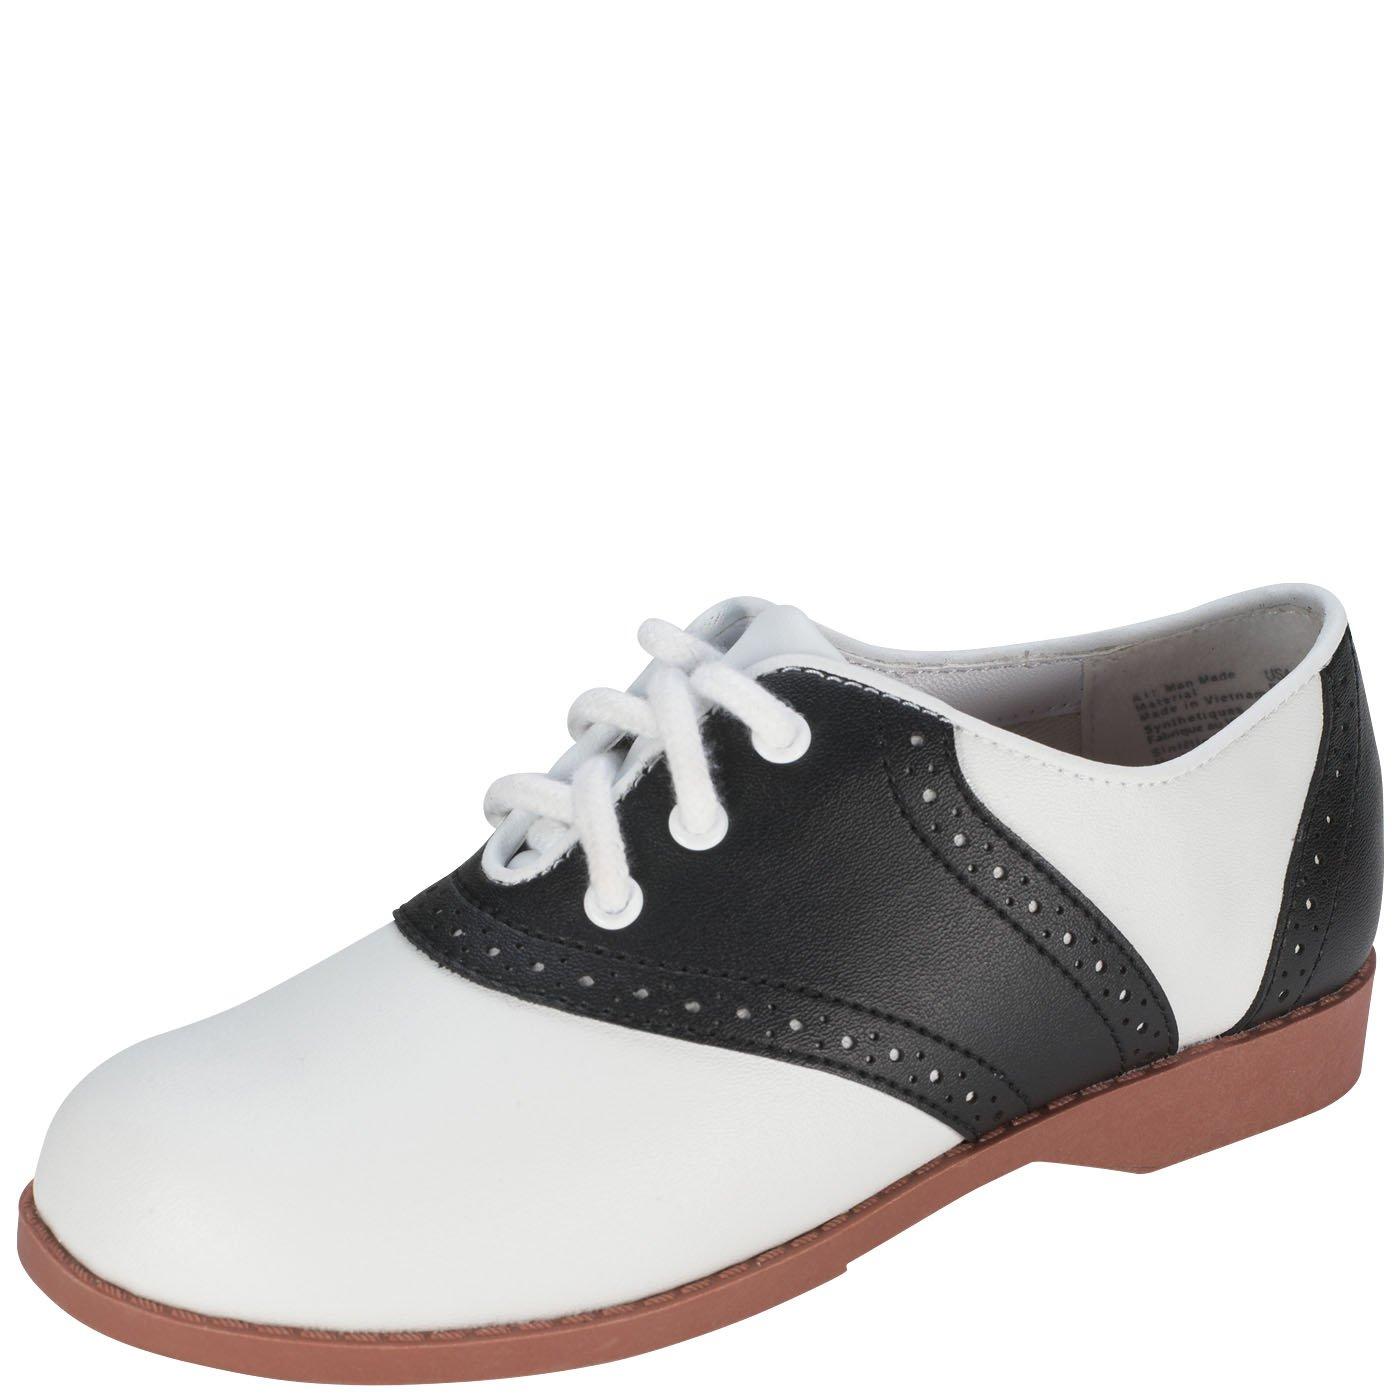 SmartFit Girl's Black/White Saddle Oxford 11 M US